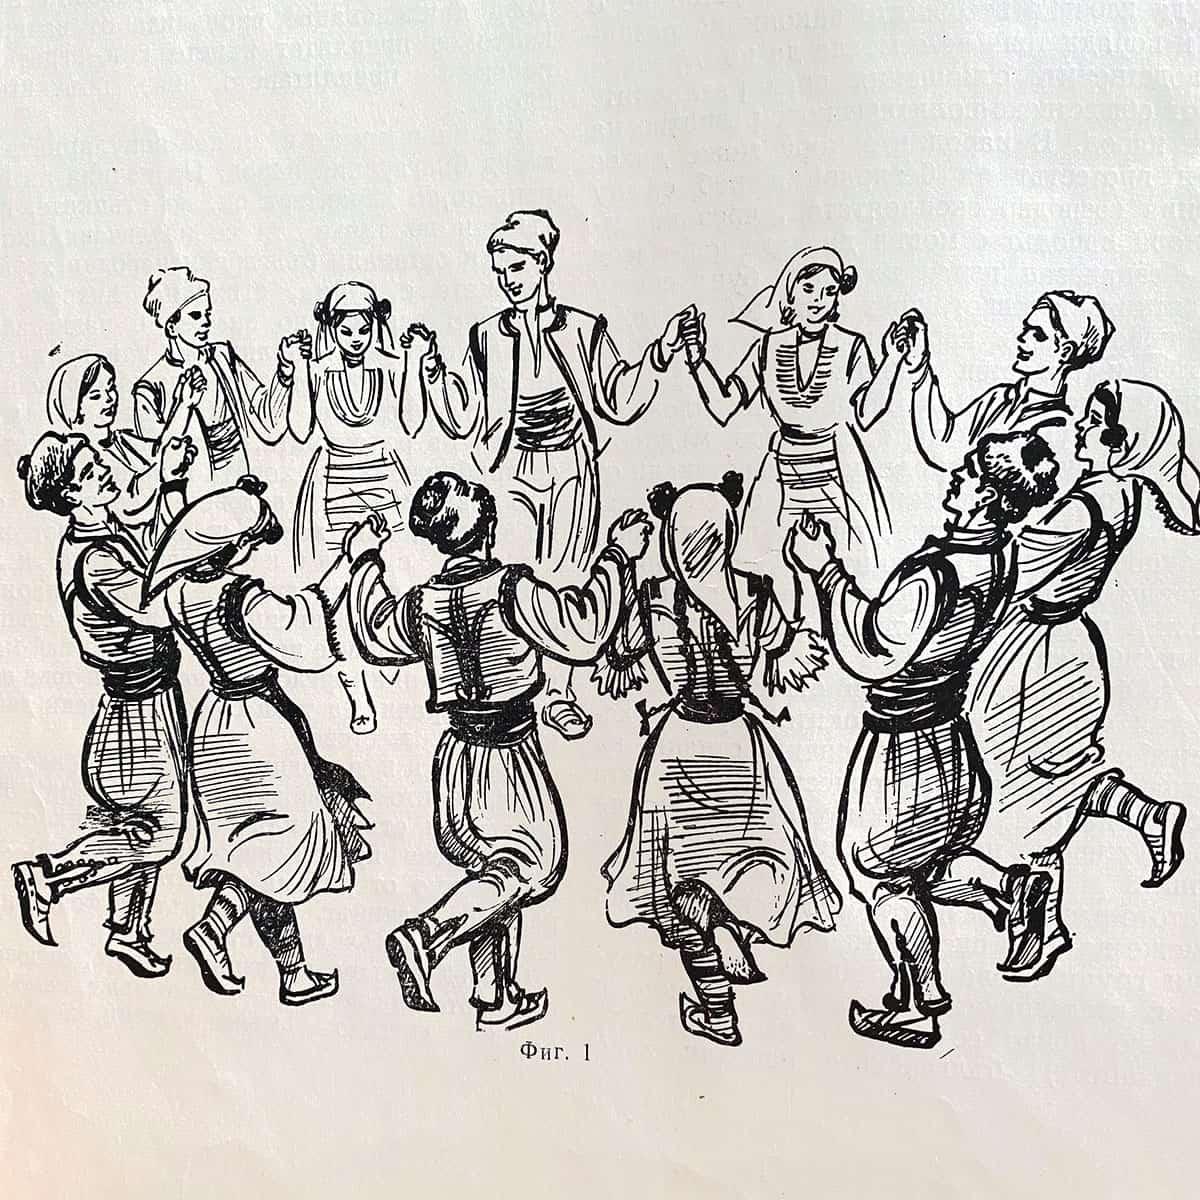 танцуване на Ганкино хоро - фигура 1